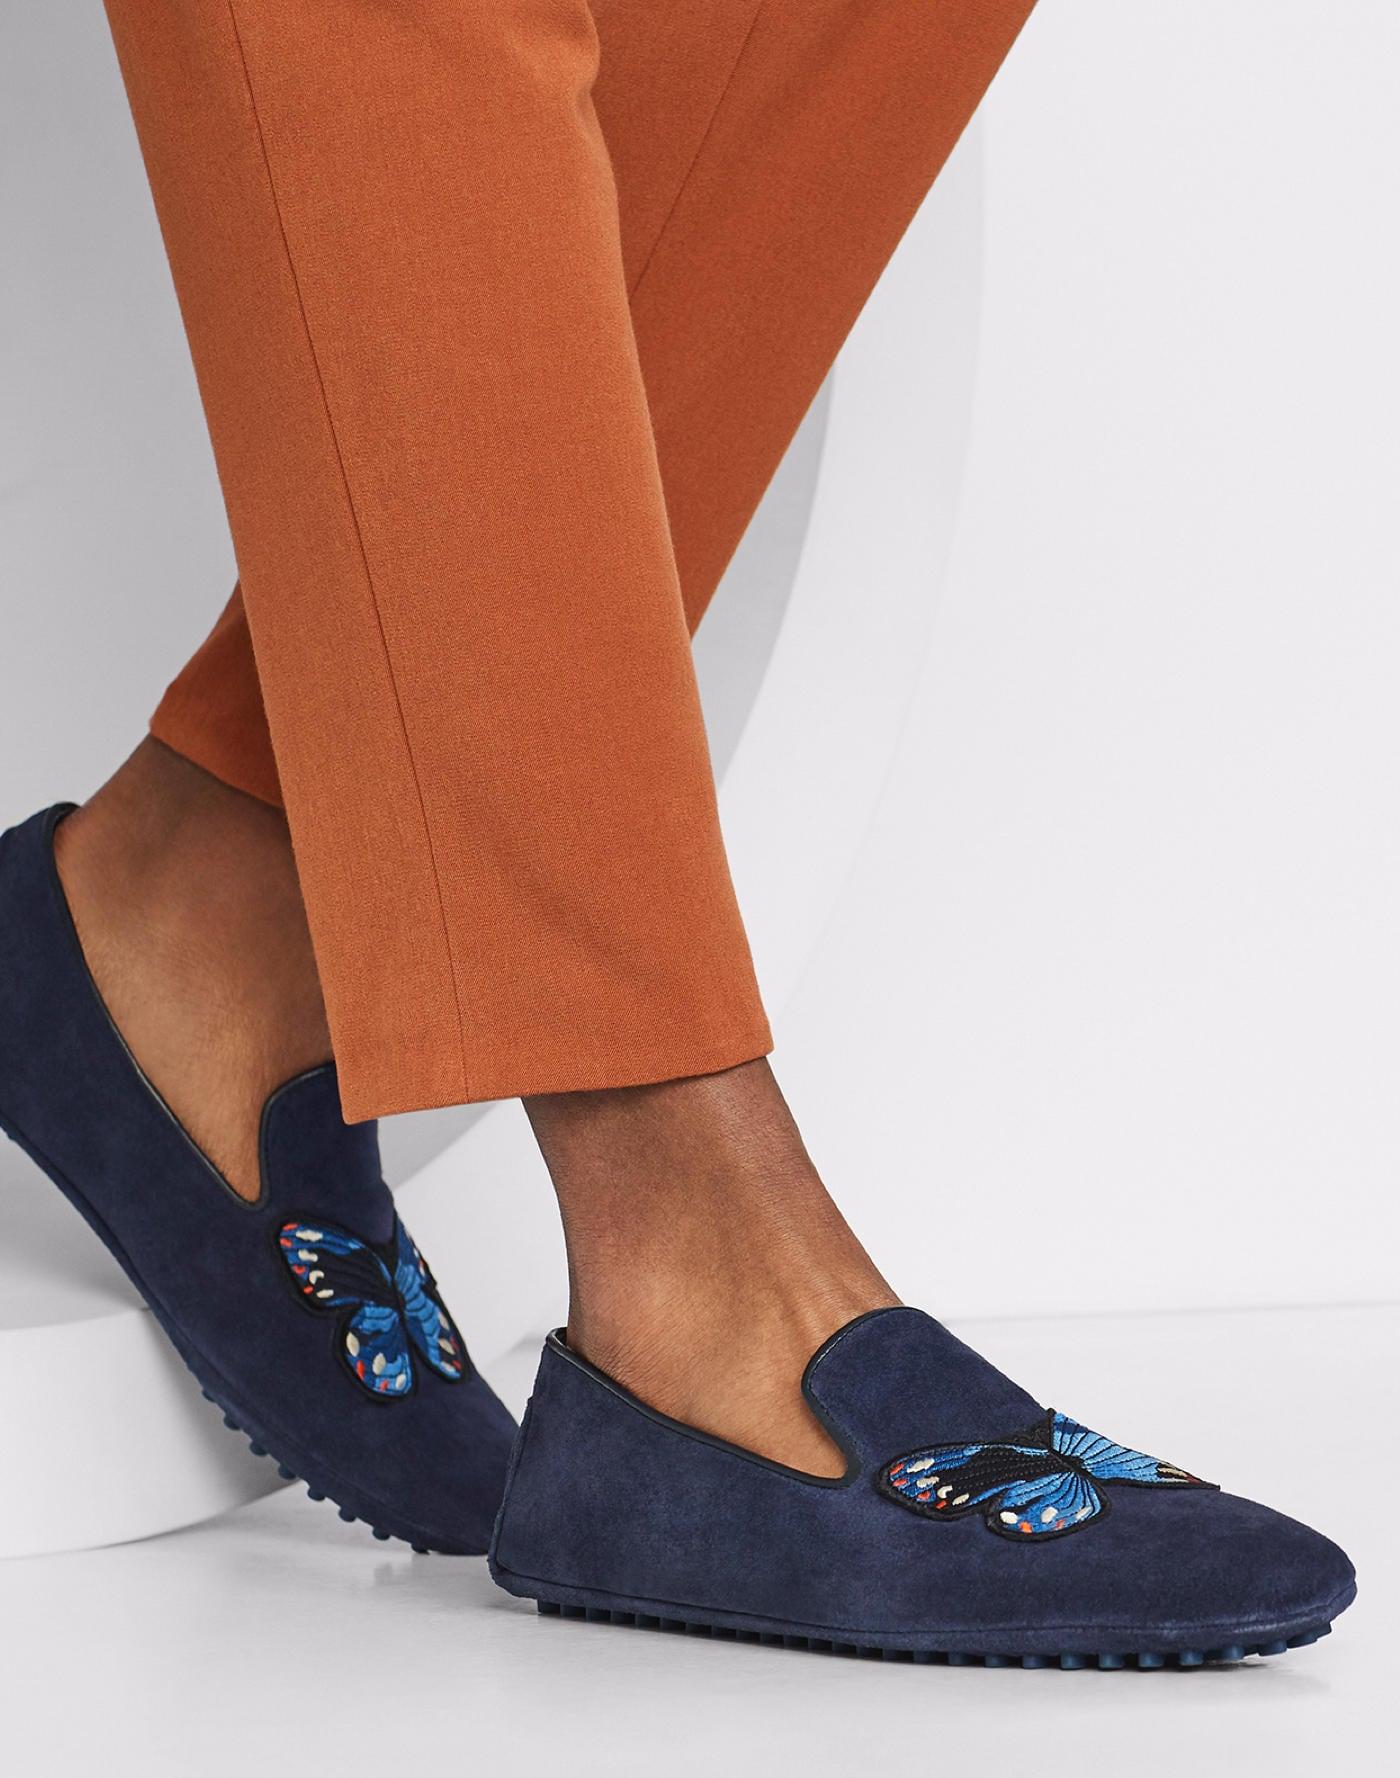 5c00e0daf5 Men's Shoes, Boots, Sandals, Sneakers, Bags and Accessories | ALDO US |  Aldoshoes.com US